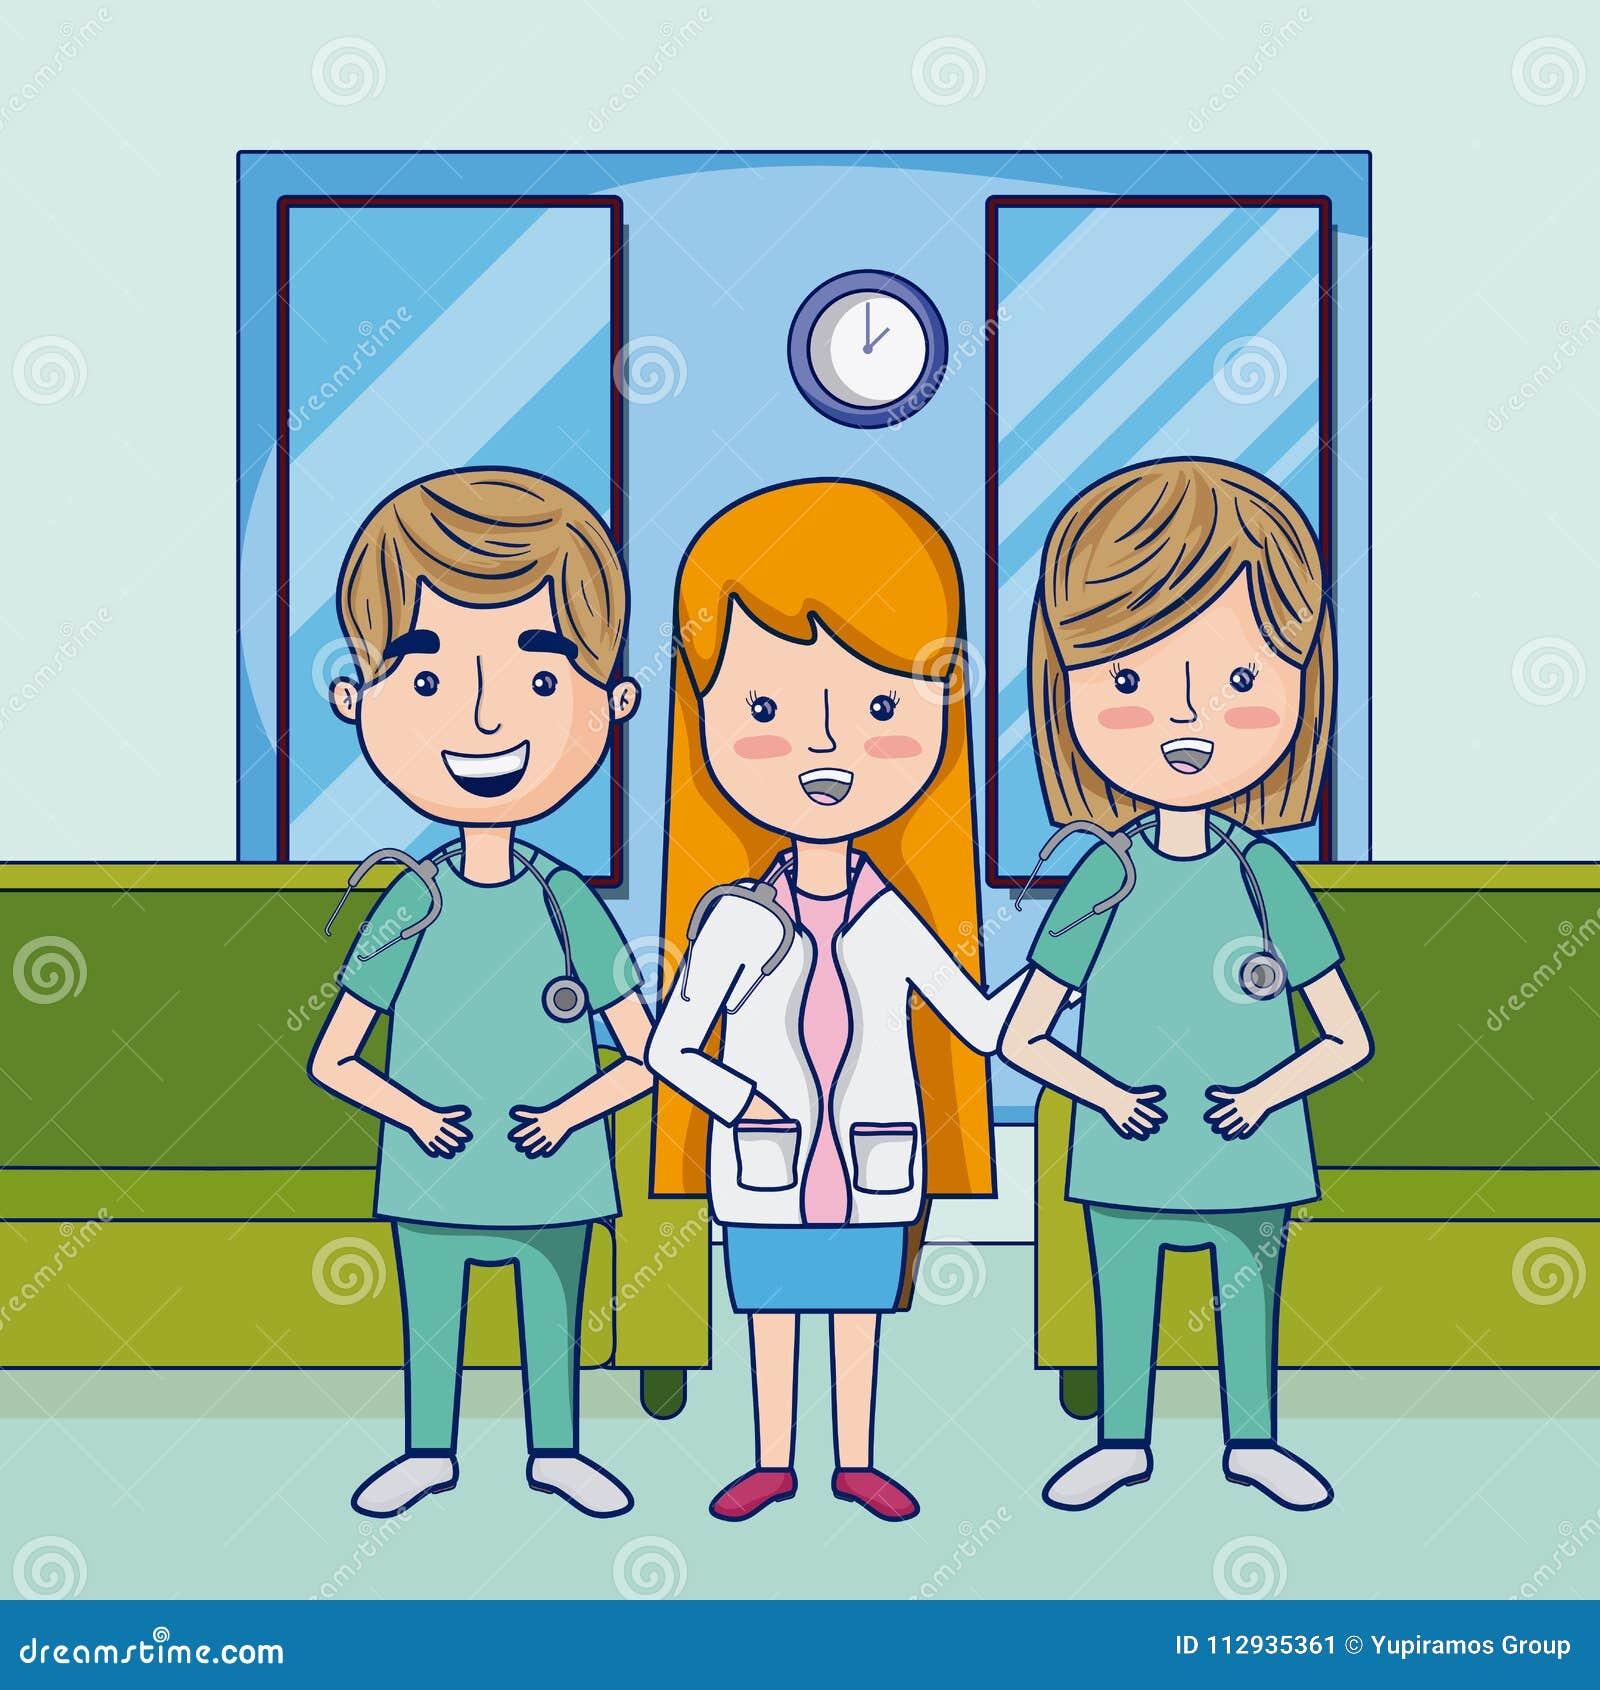 Funny Cartoon Hospital Pics funny doctors cartoons stock vector. illustration of graphic